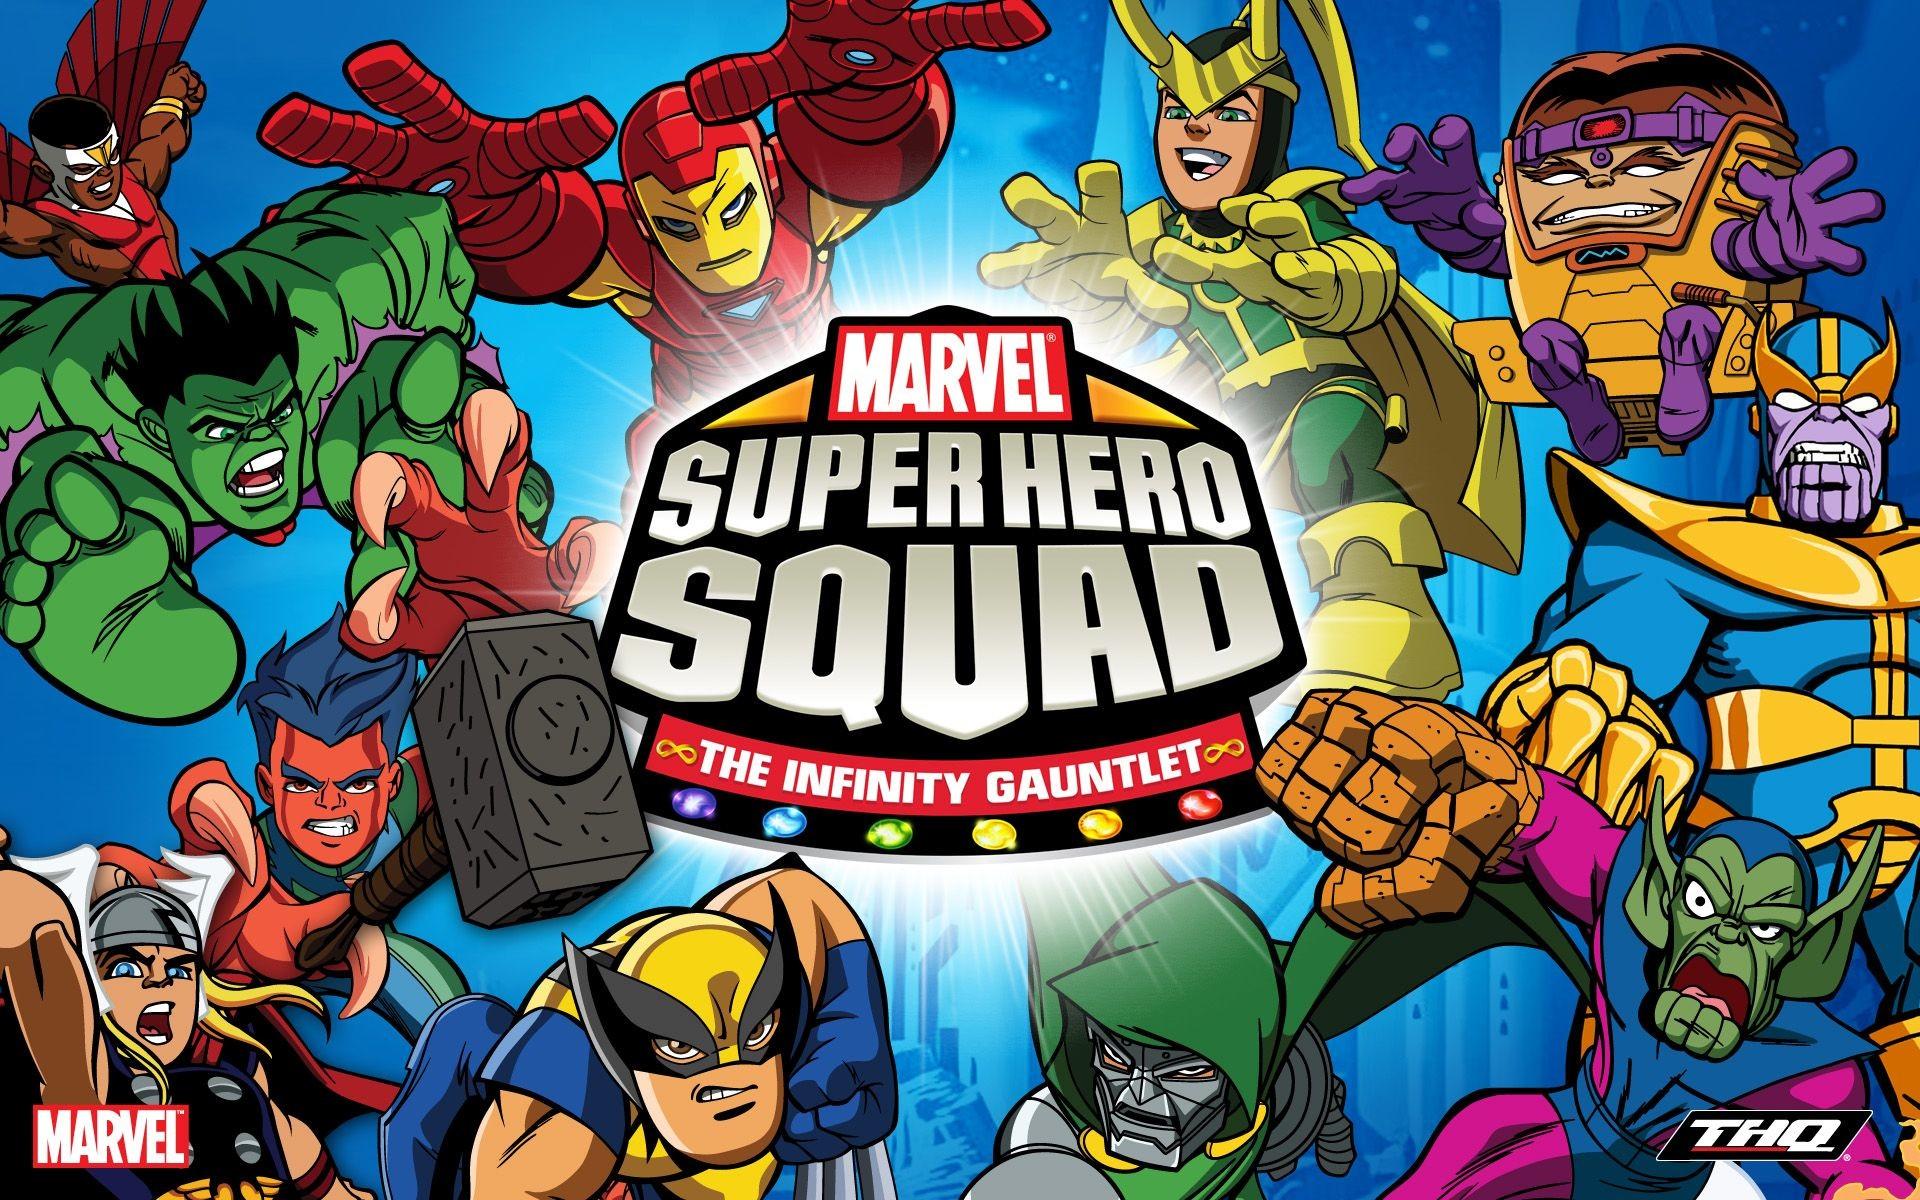 Res: 1920x1200, Marvel Super Hero Squad Online | Marvel Super Hero Squad Online wallpaper 3